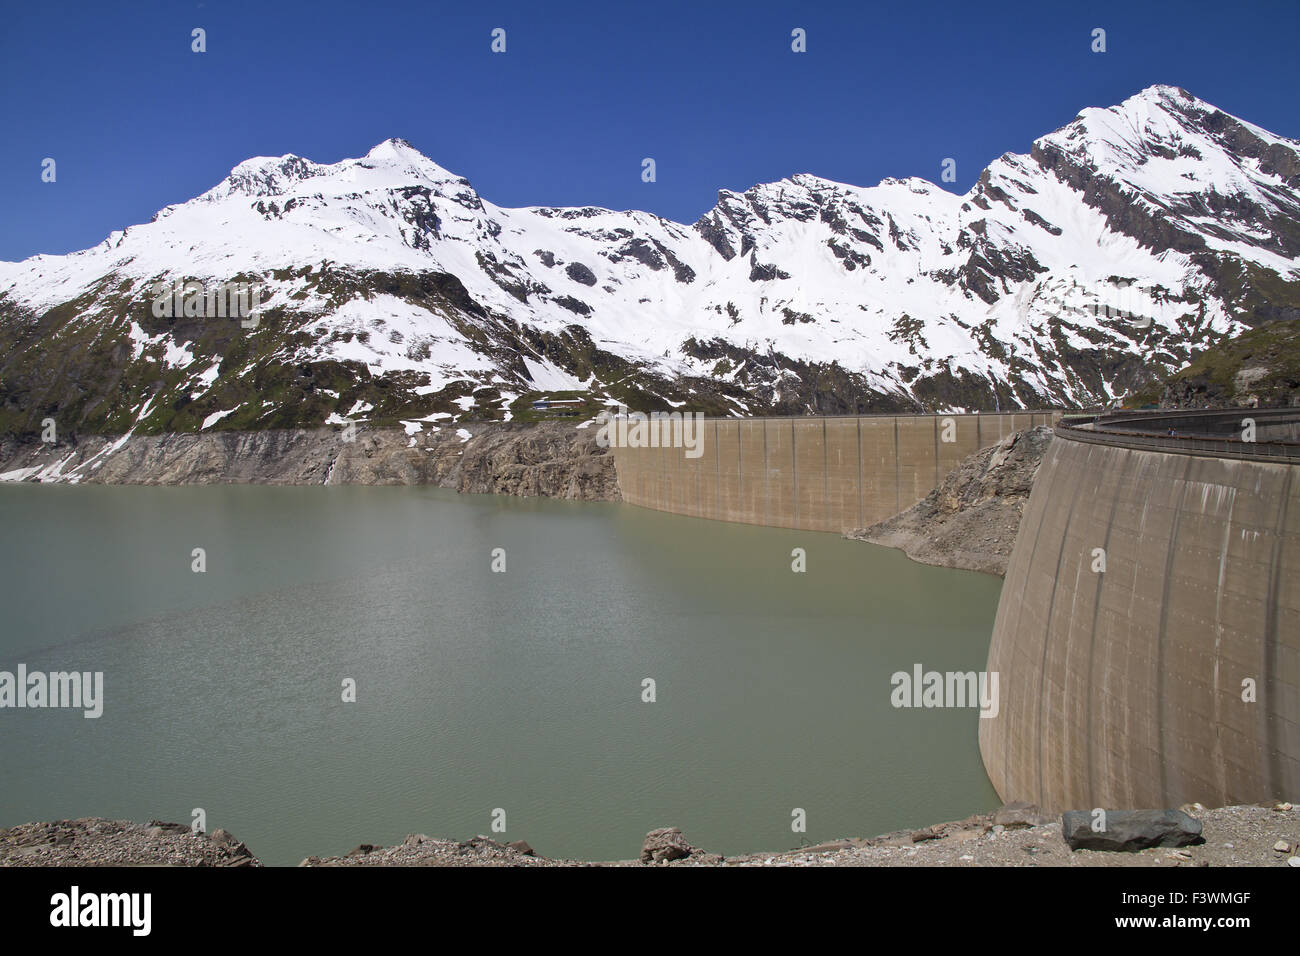 Mooserboden reservoir in Kaprun, Austria Stock Photo